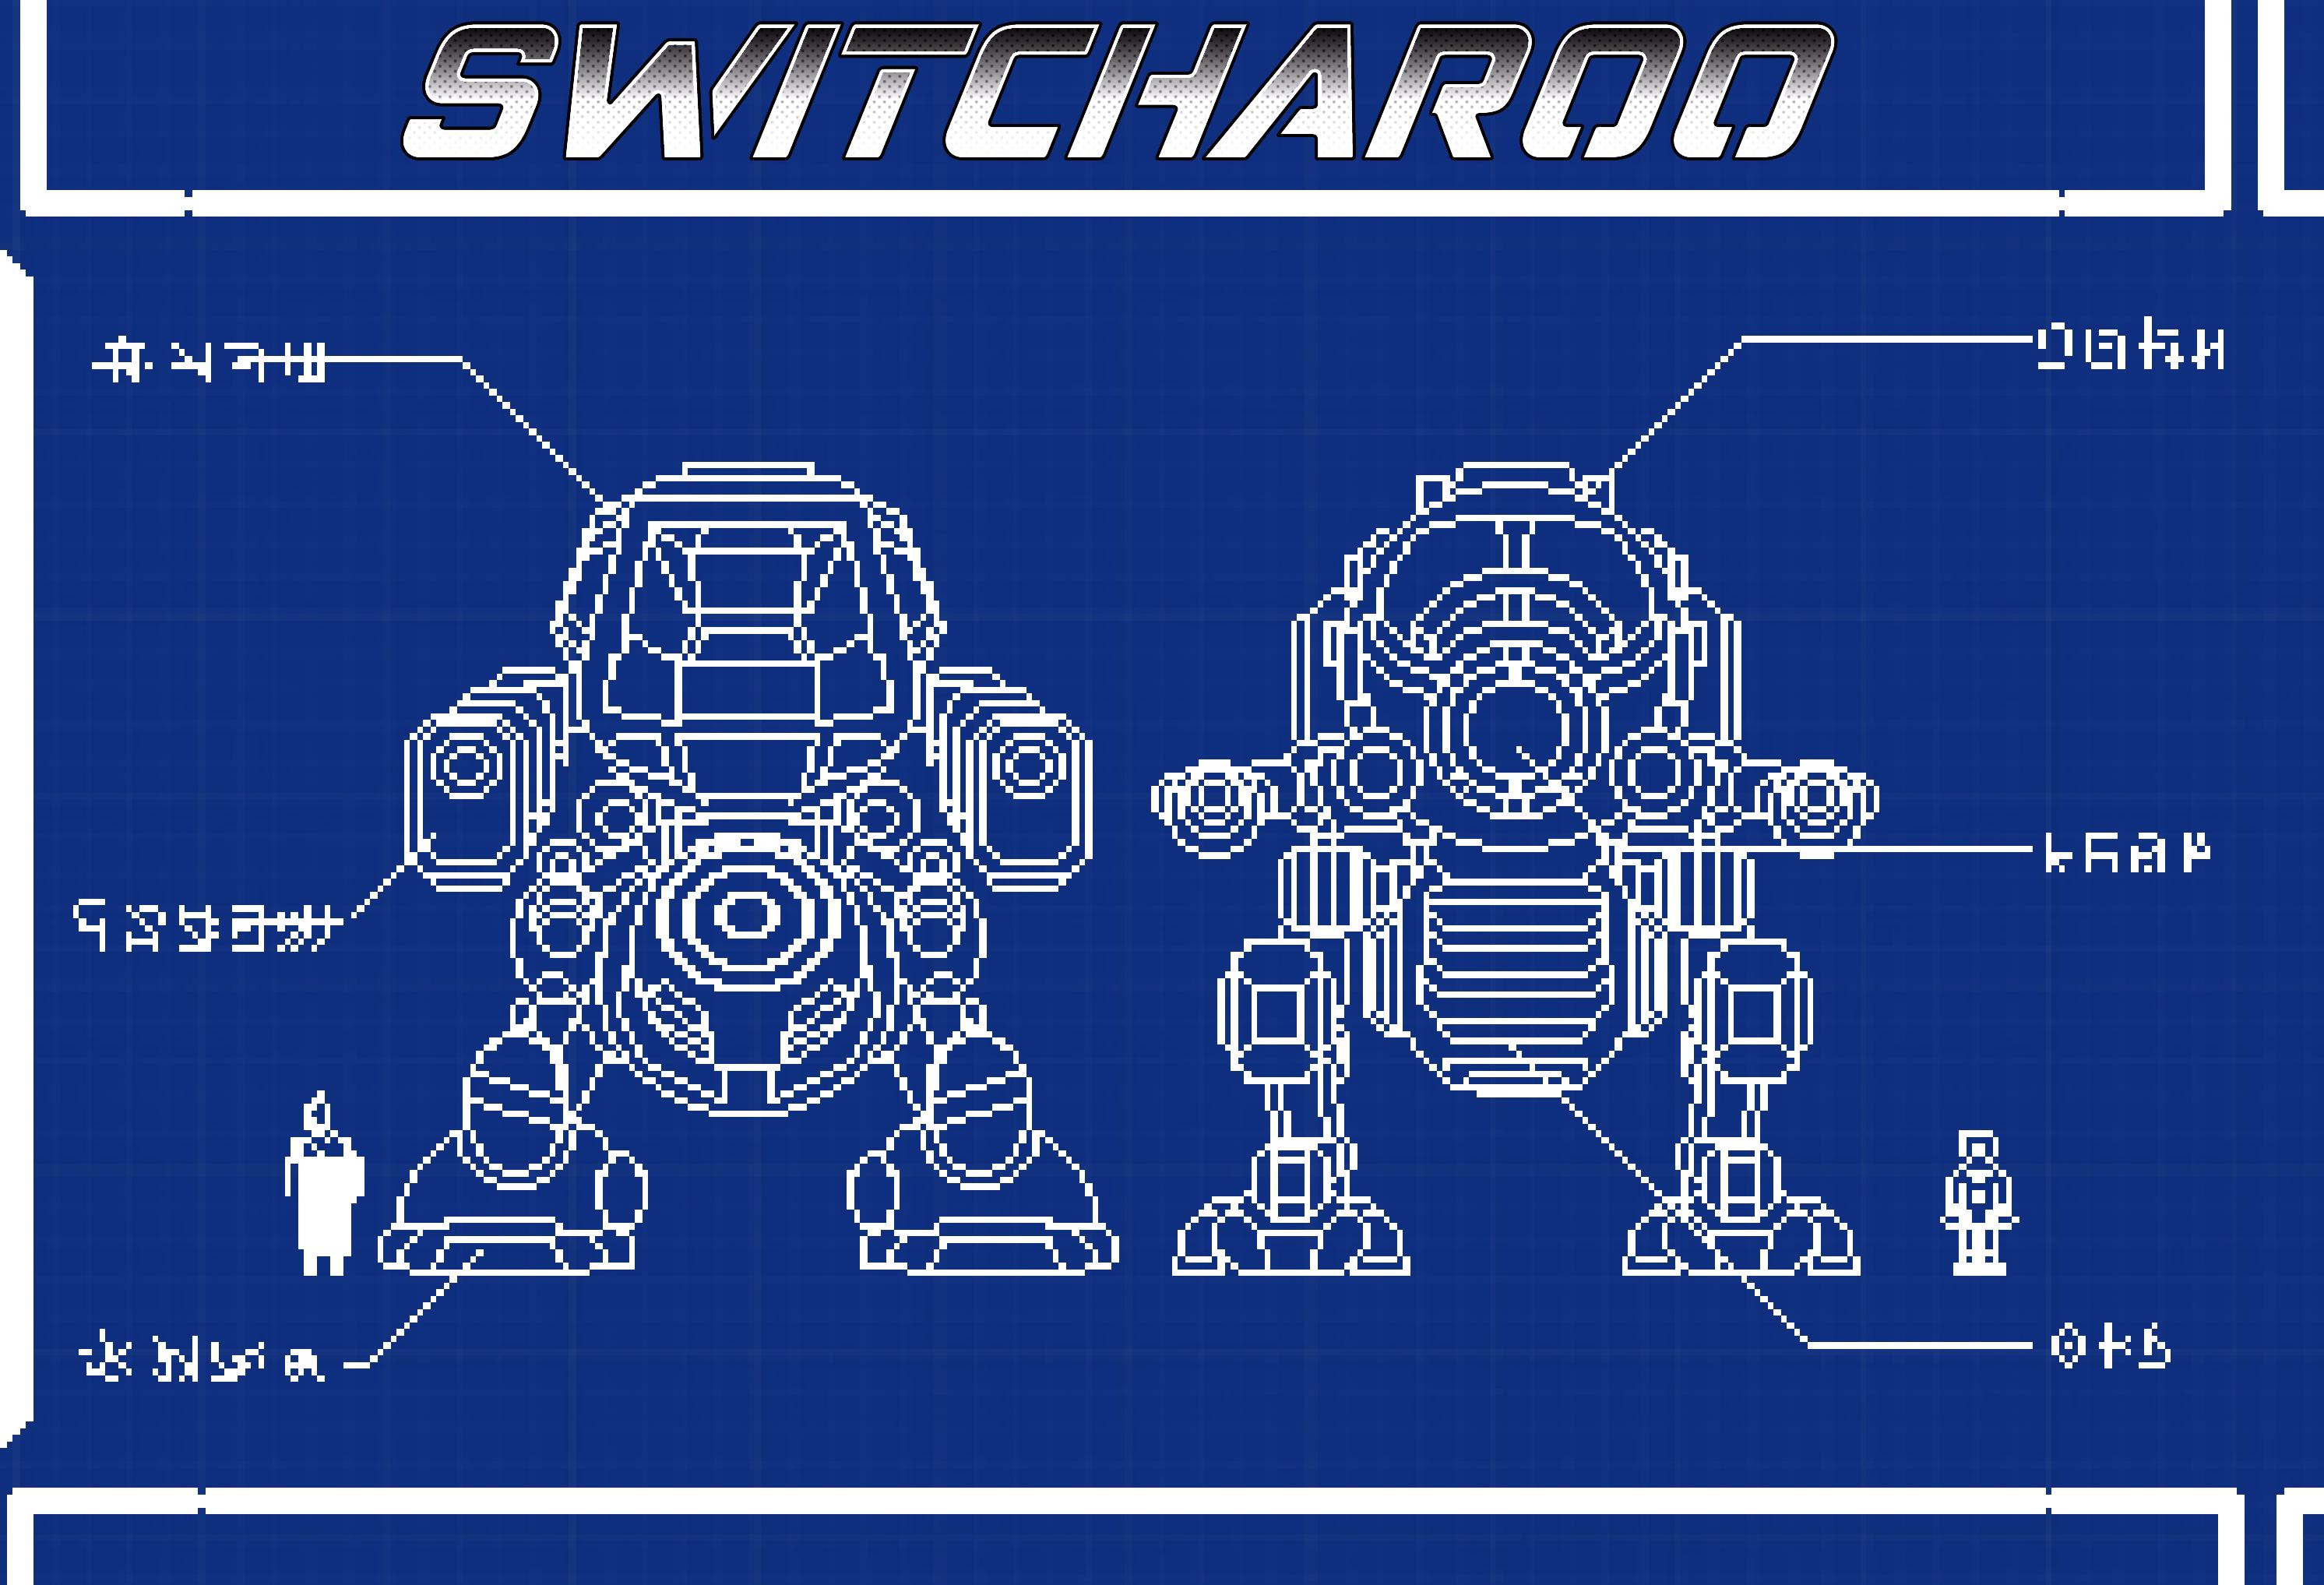 Switcharoo